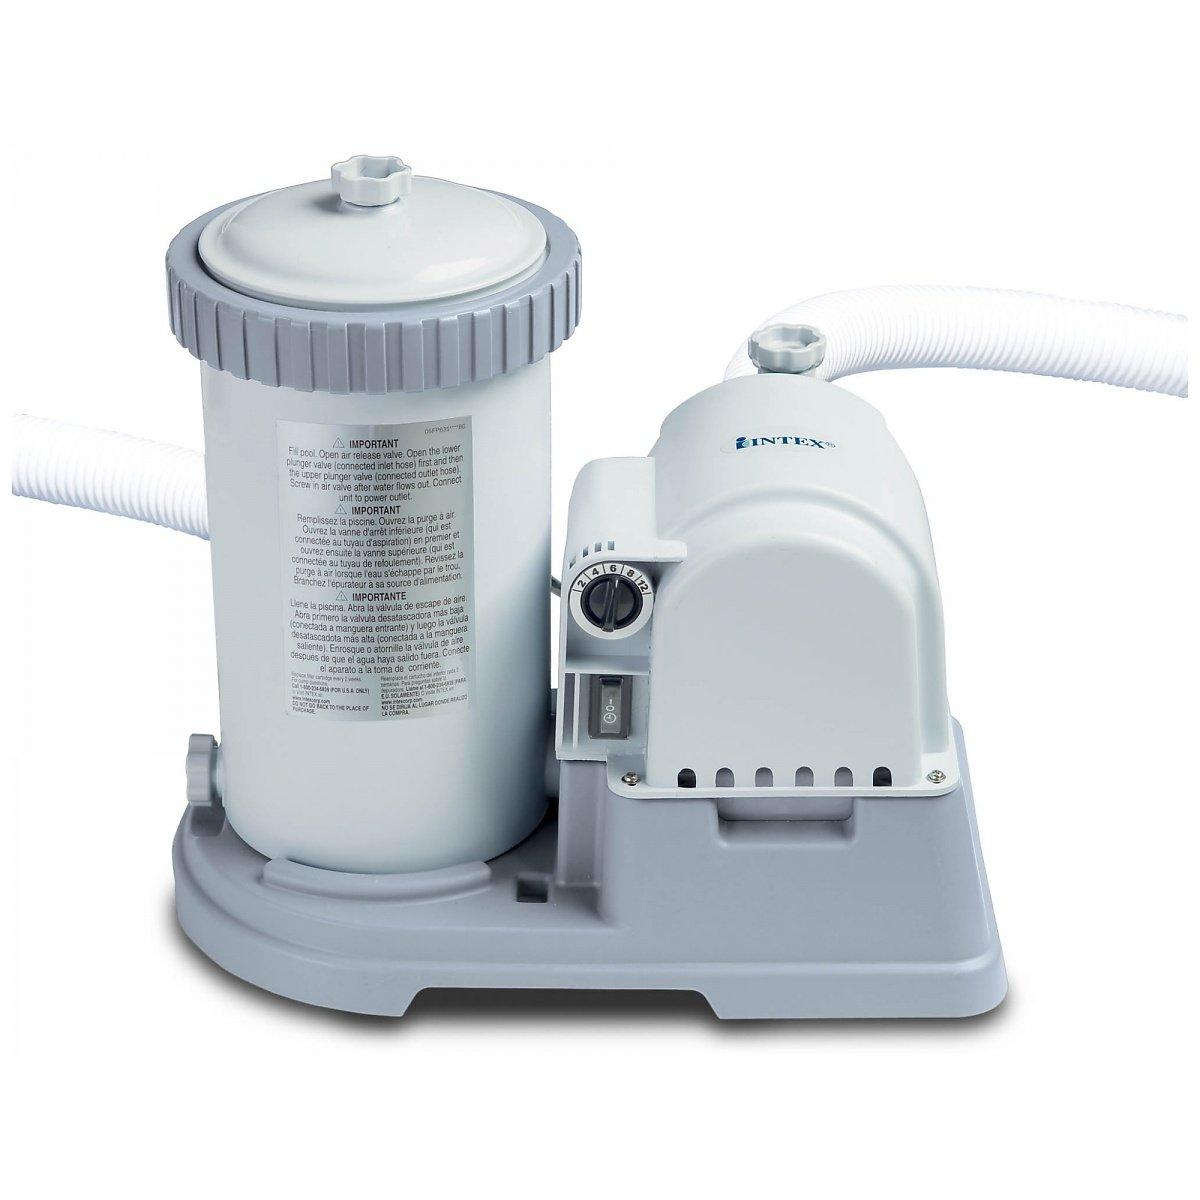 Intex Krystal Clear Cartridge Filter Pump For Above Ground Pools 2500 Gph Pum Ebay